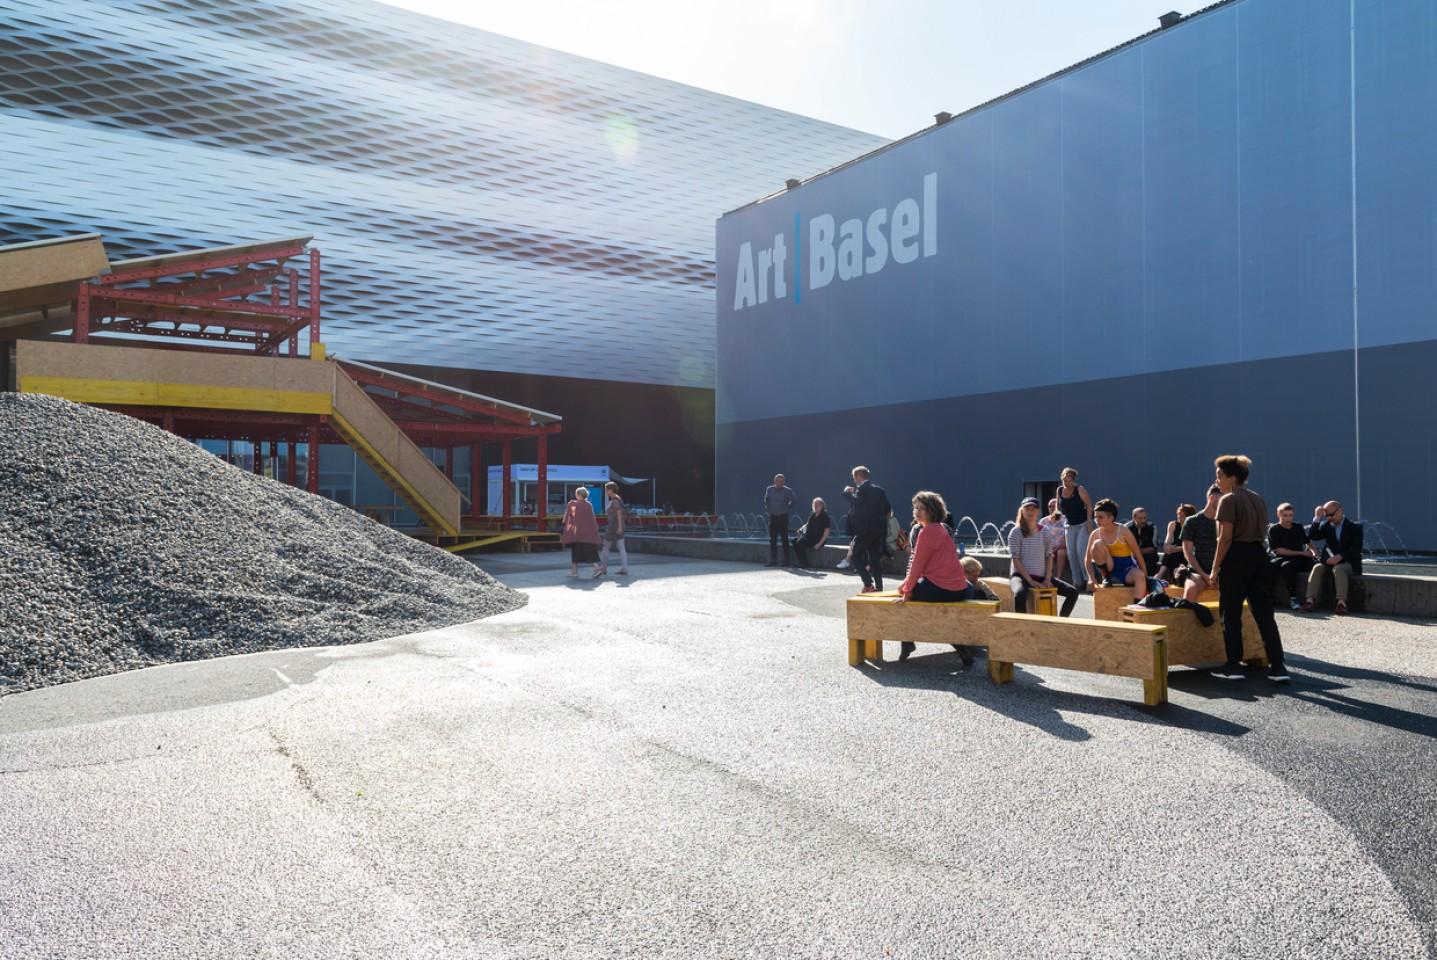 Art Basel Basilea 2018